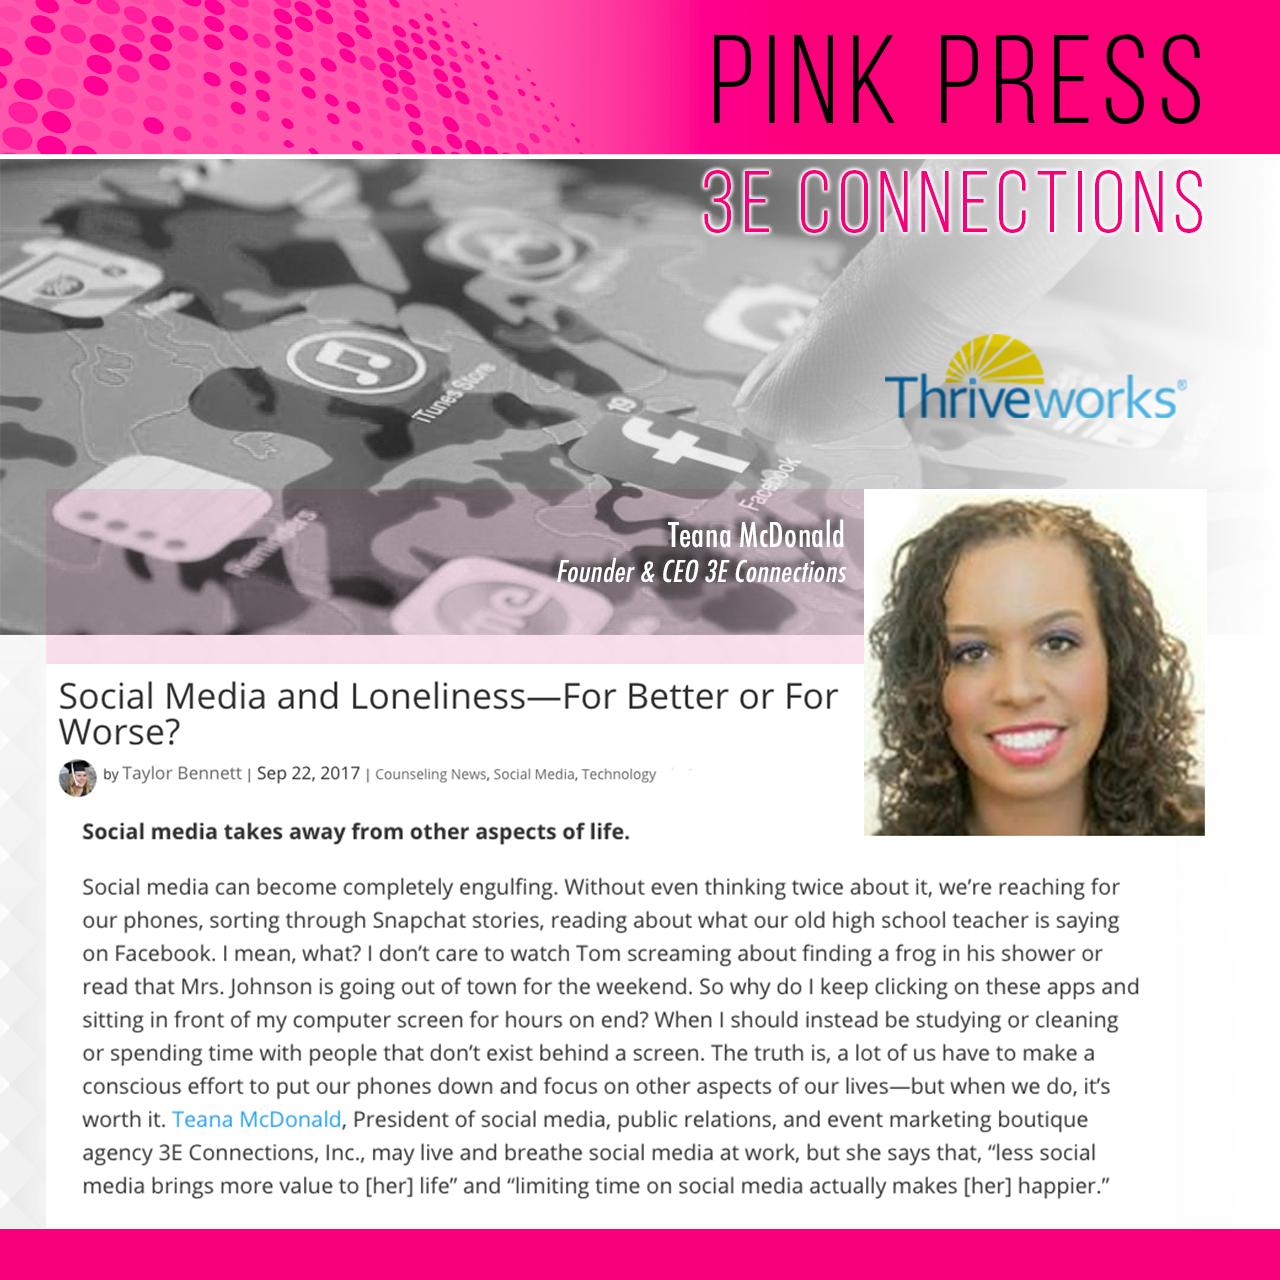 PinkPress_triveworks.png